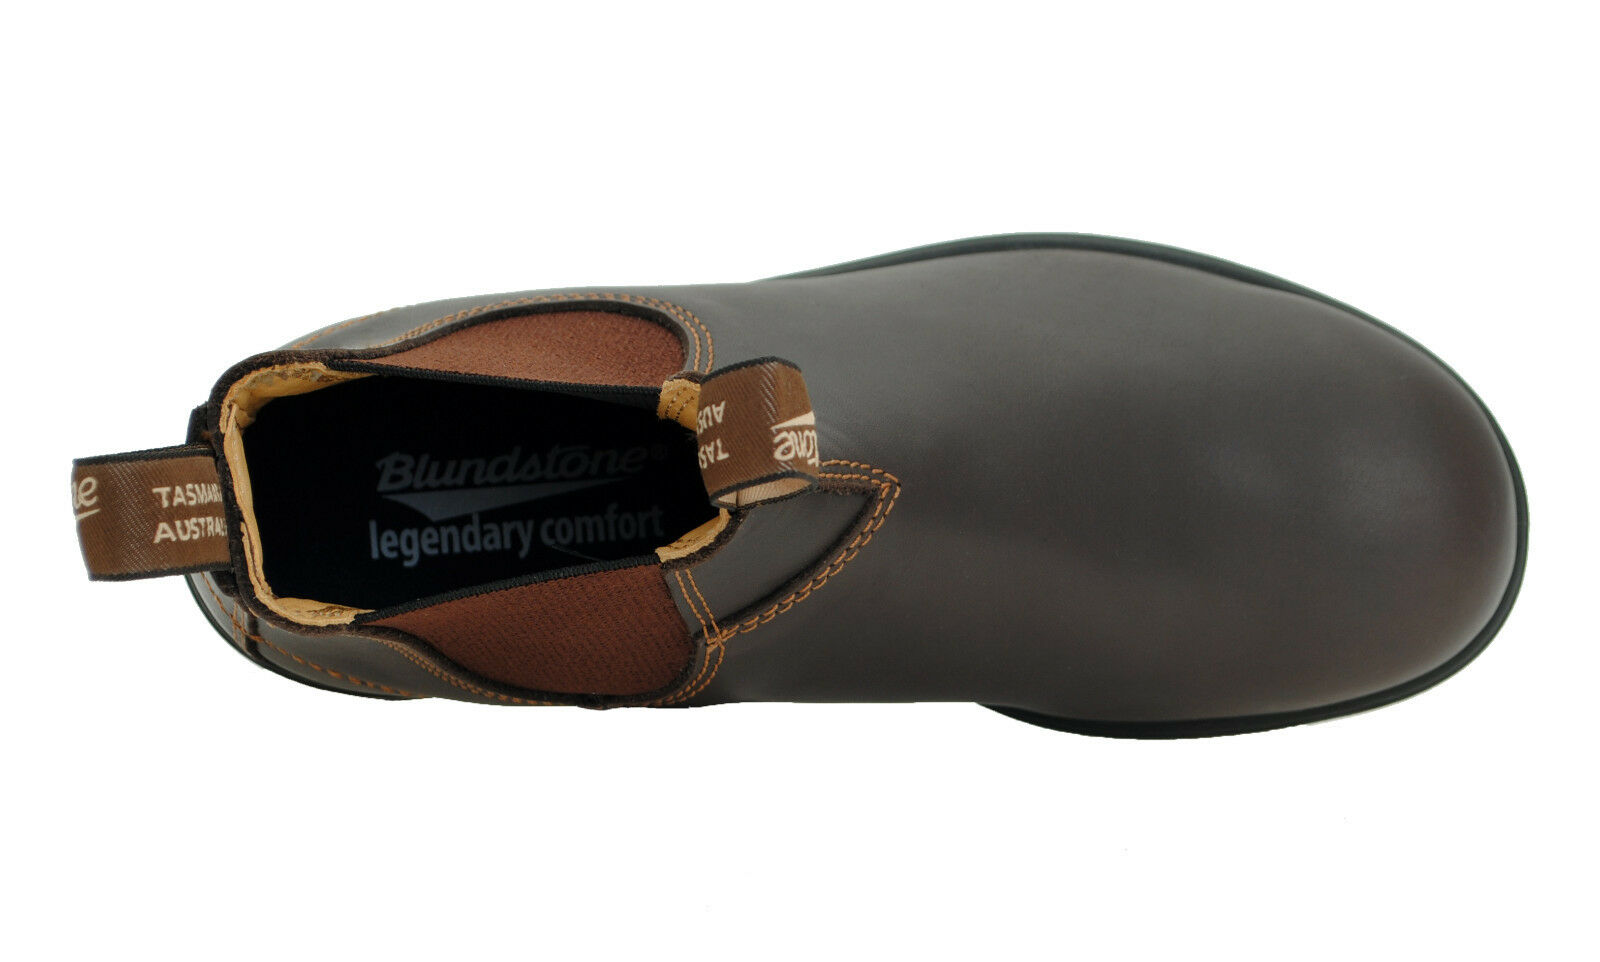 550 Homme Style Femme Bottines Blundstone Australian Ow0Pk8n